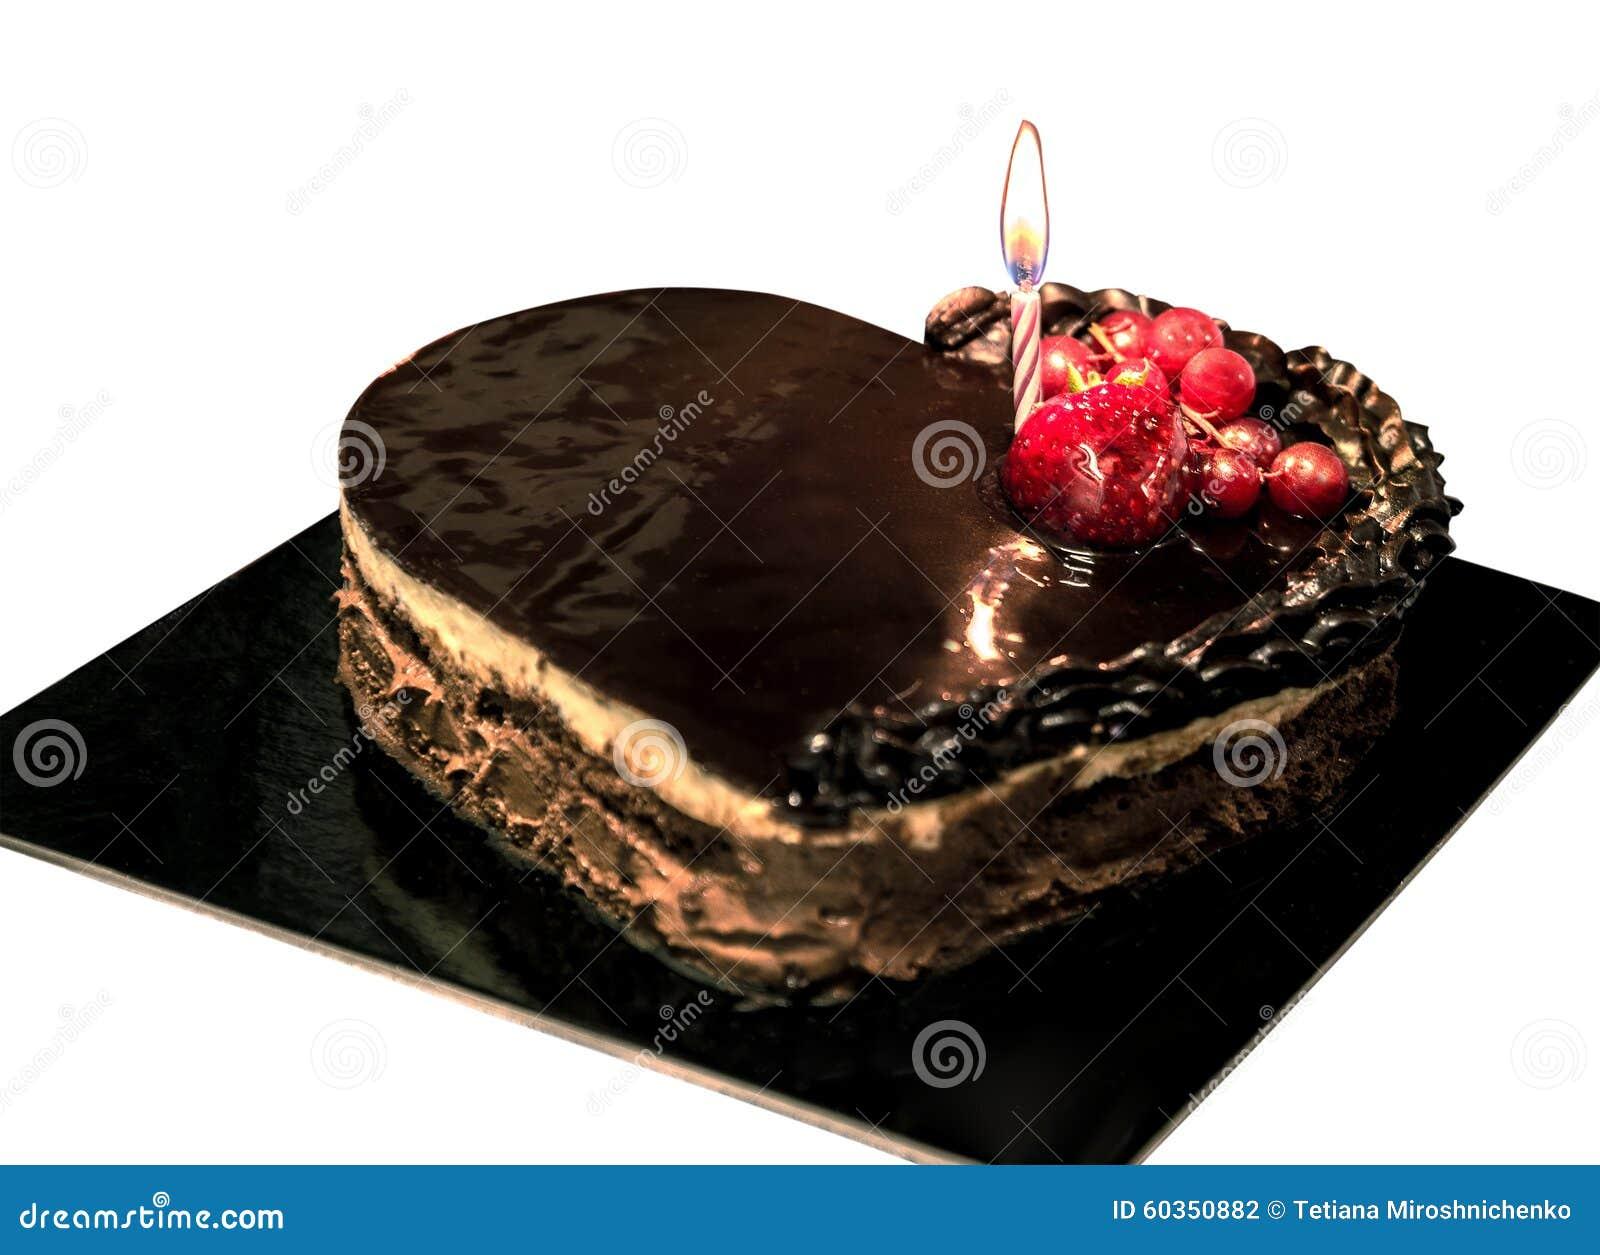 chokolate kuchen mit frucht stockfoto bild 60350882. Black Bedroom Furniture Sets. Home Design Ideas